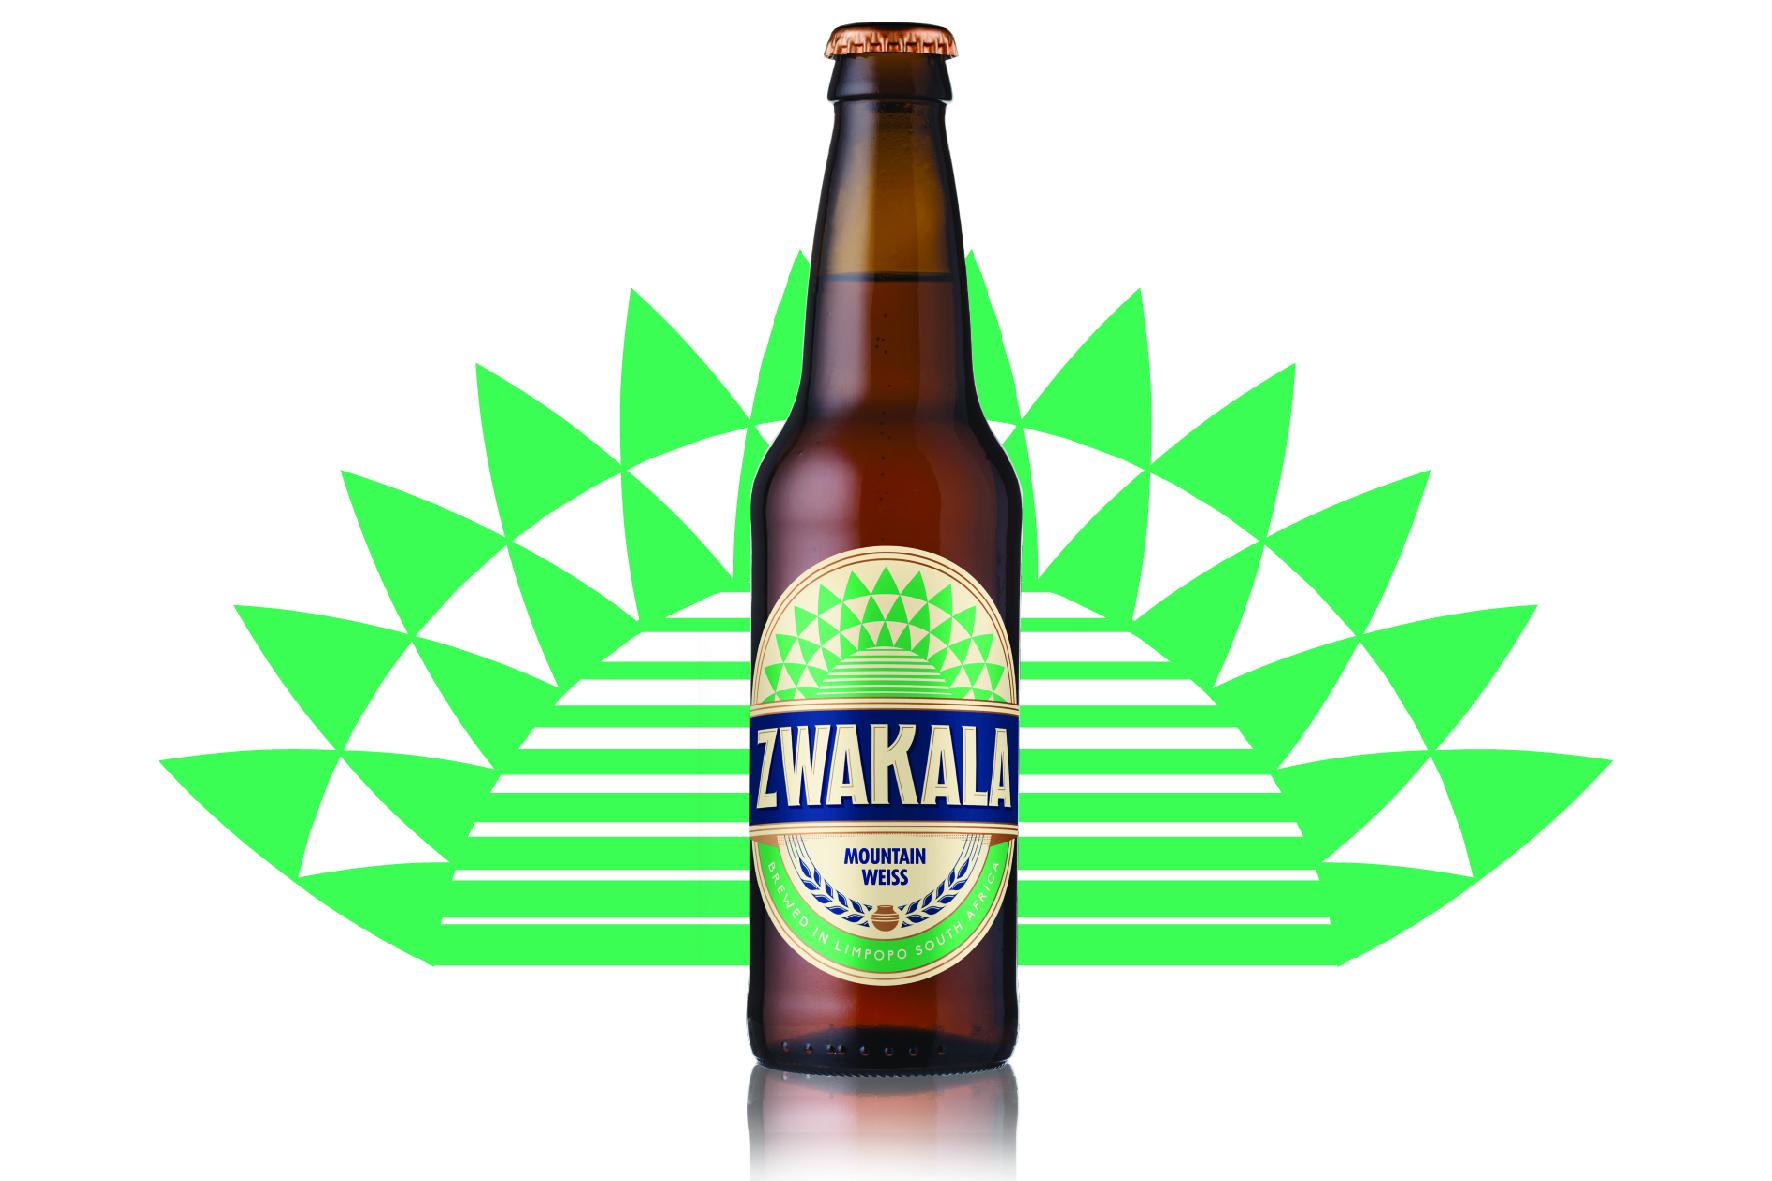 best-weiss-in-south-africa-zwakala-brewery